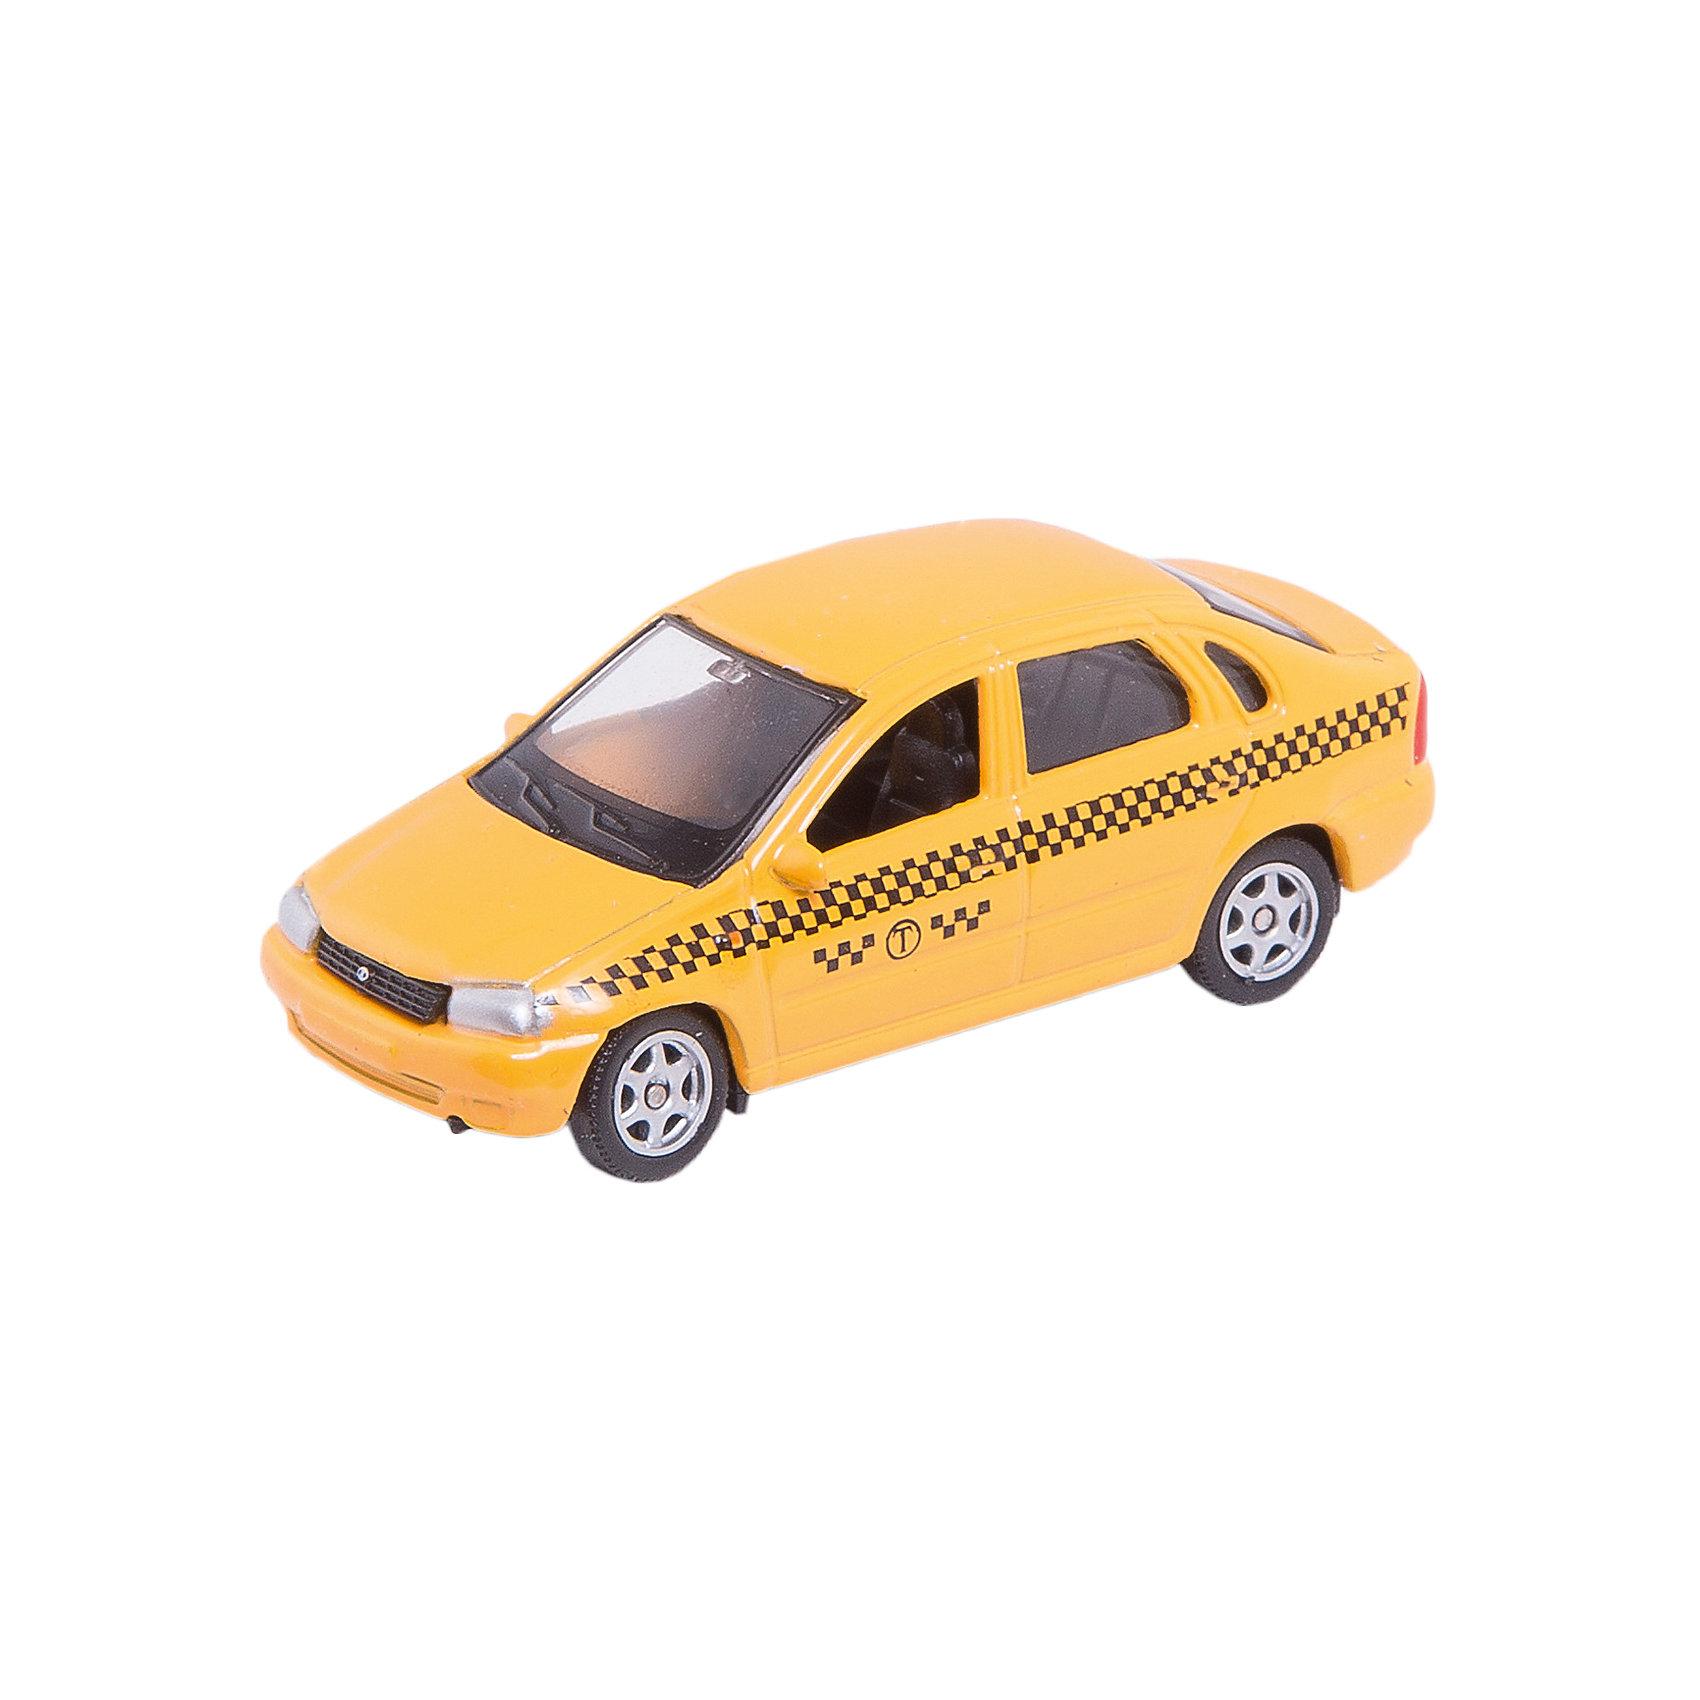 Машинка Lada Kalina такси 1:60, AutotimeМашинки<br><br><br>Ширина мм: 100<br>Глубина мм: 40<br>Высота мм: 40<br>Вес г: 16<br>Возраст от месяцев: 36<br>Возраст до месяцев: 2147483647<br>Пол: Мужской<br>Возраст: Детский<br>SKU: 5584016